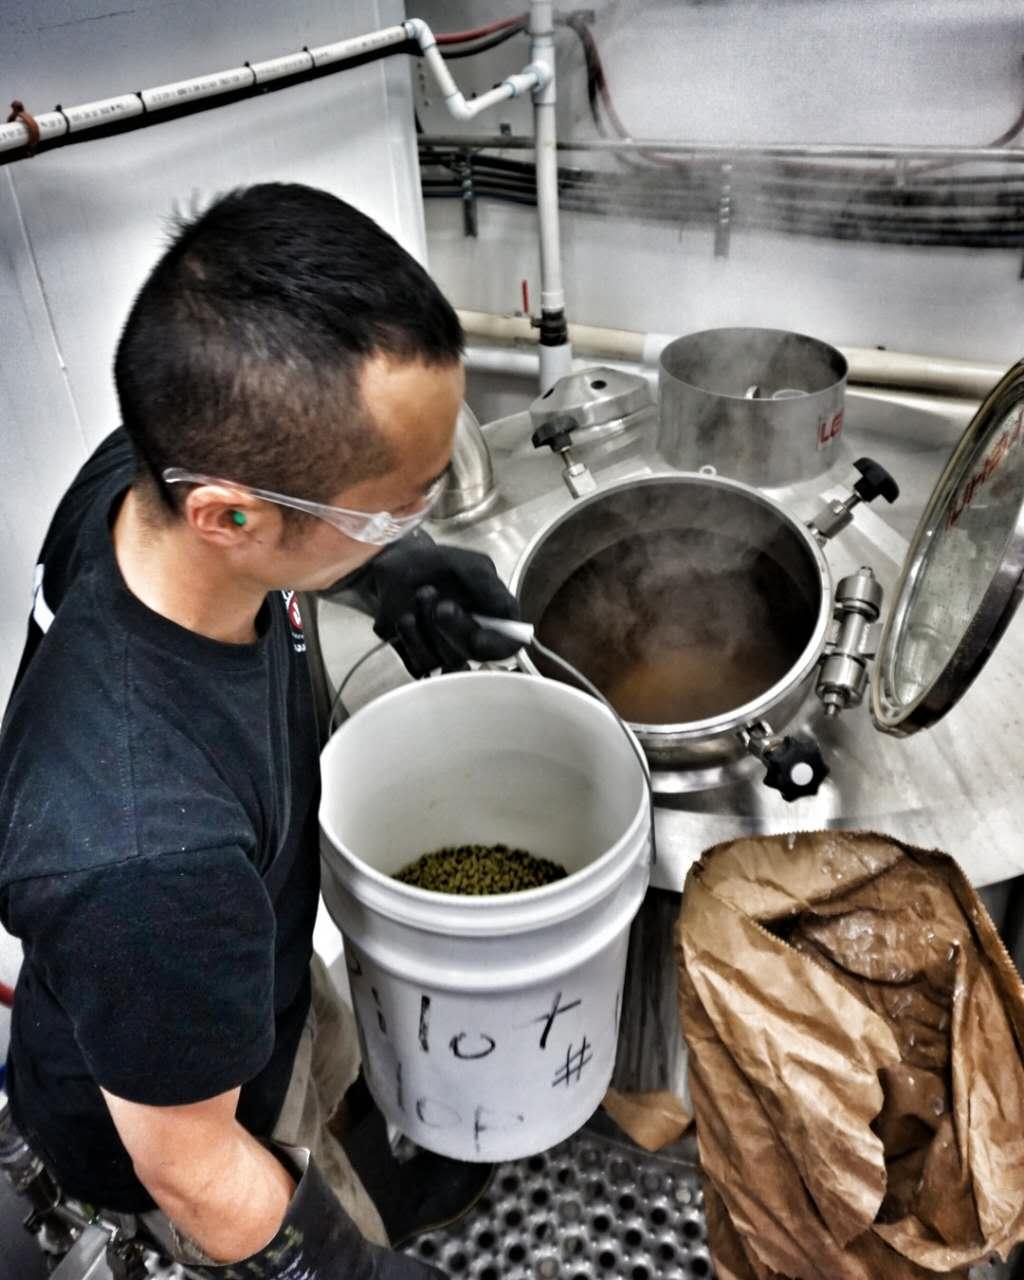 parallel 49 brewing TAPS Brewpub 8x8 Brewing Project craft beer vanpours